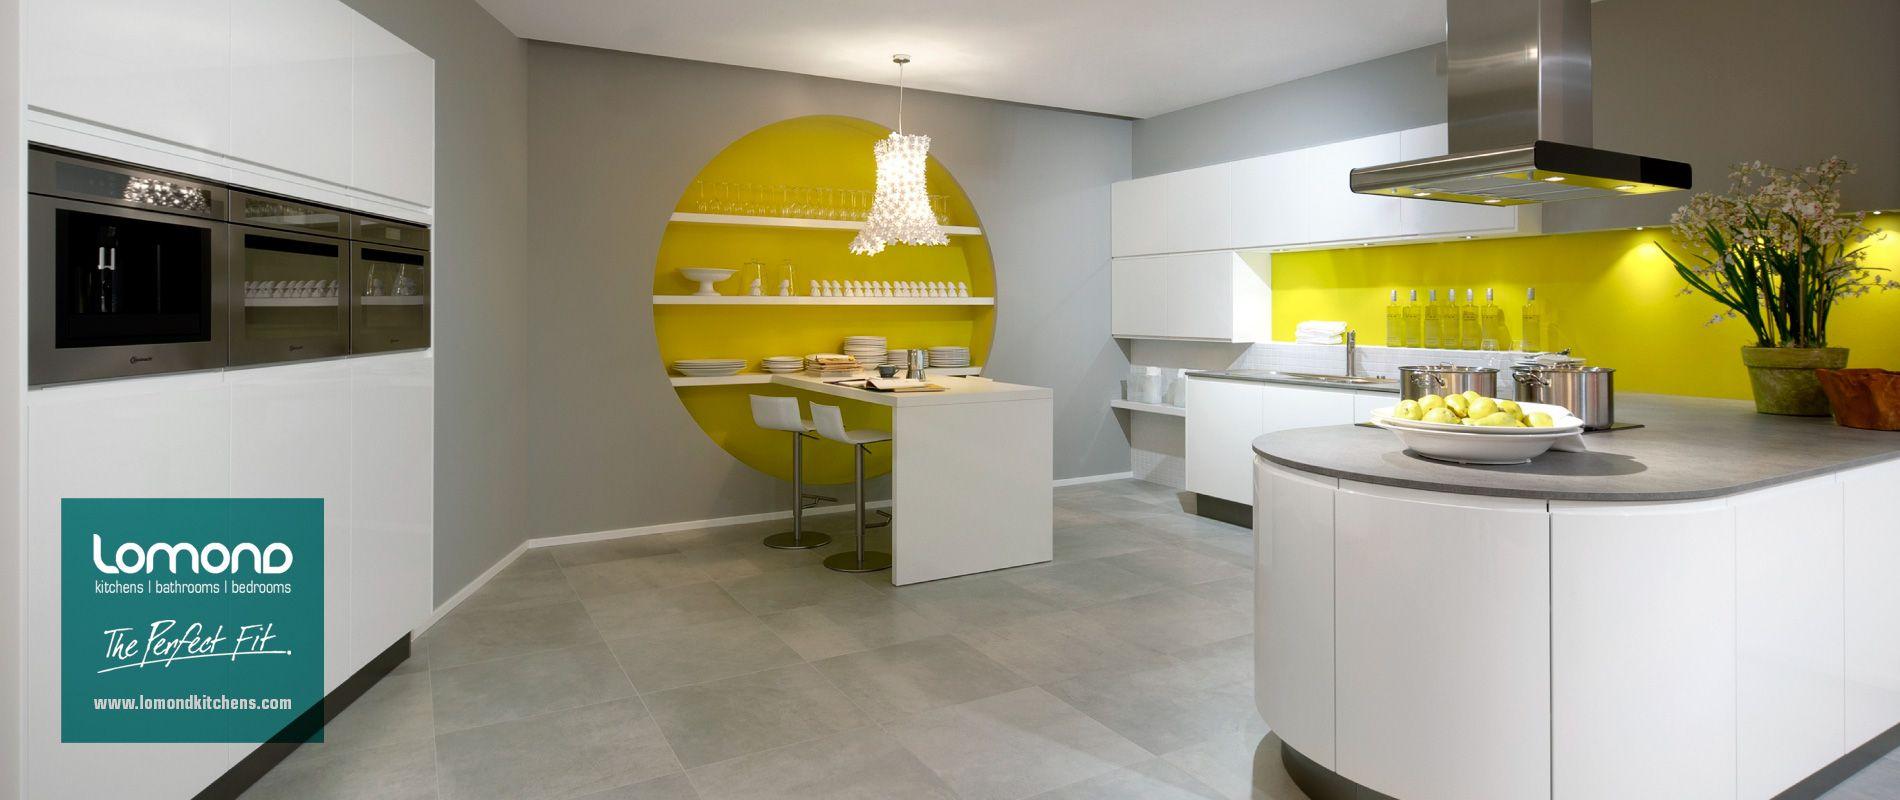 German Kitchens Design And Installation Glasgow  Kitchens Glasgow Cool Kitchen Design And Installation Inspiration Design